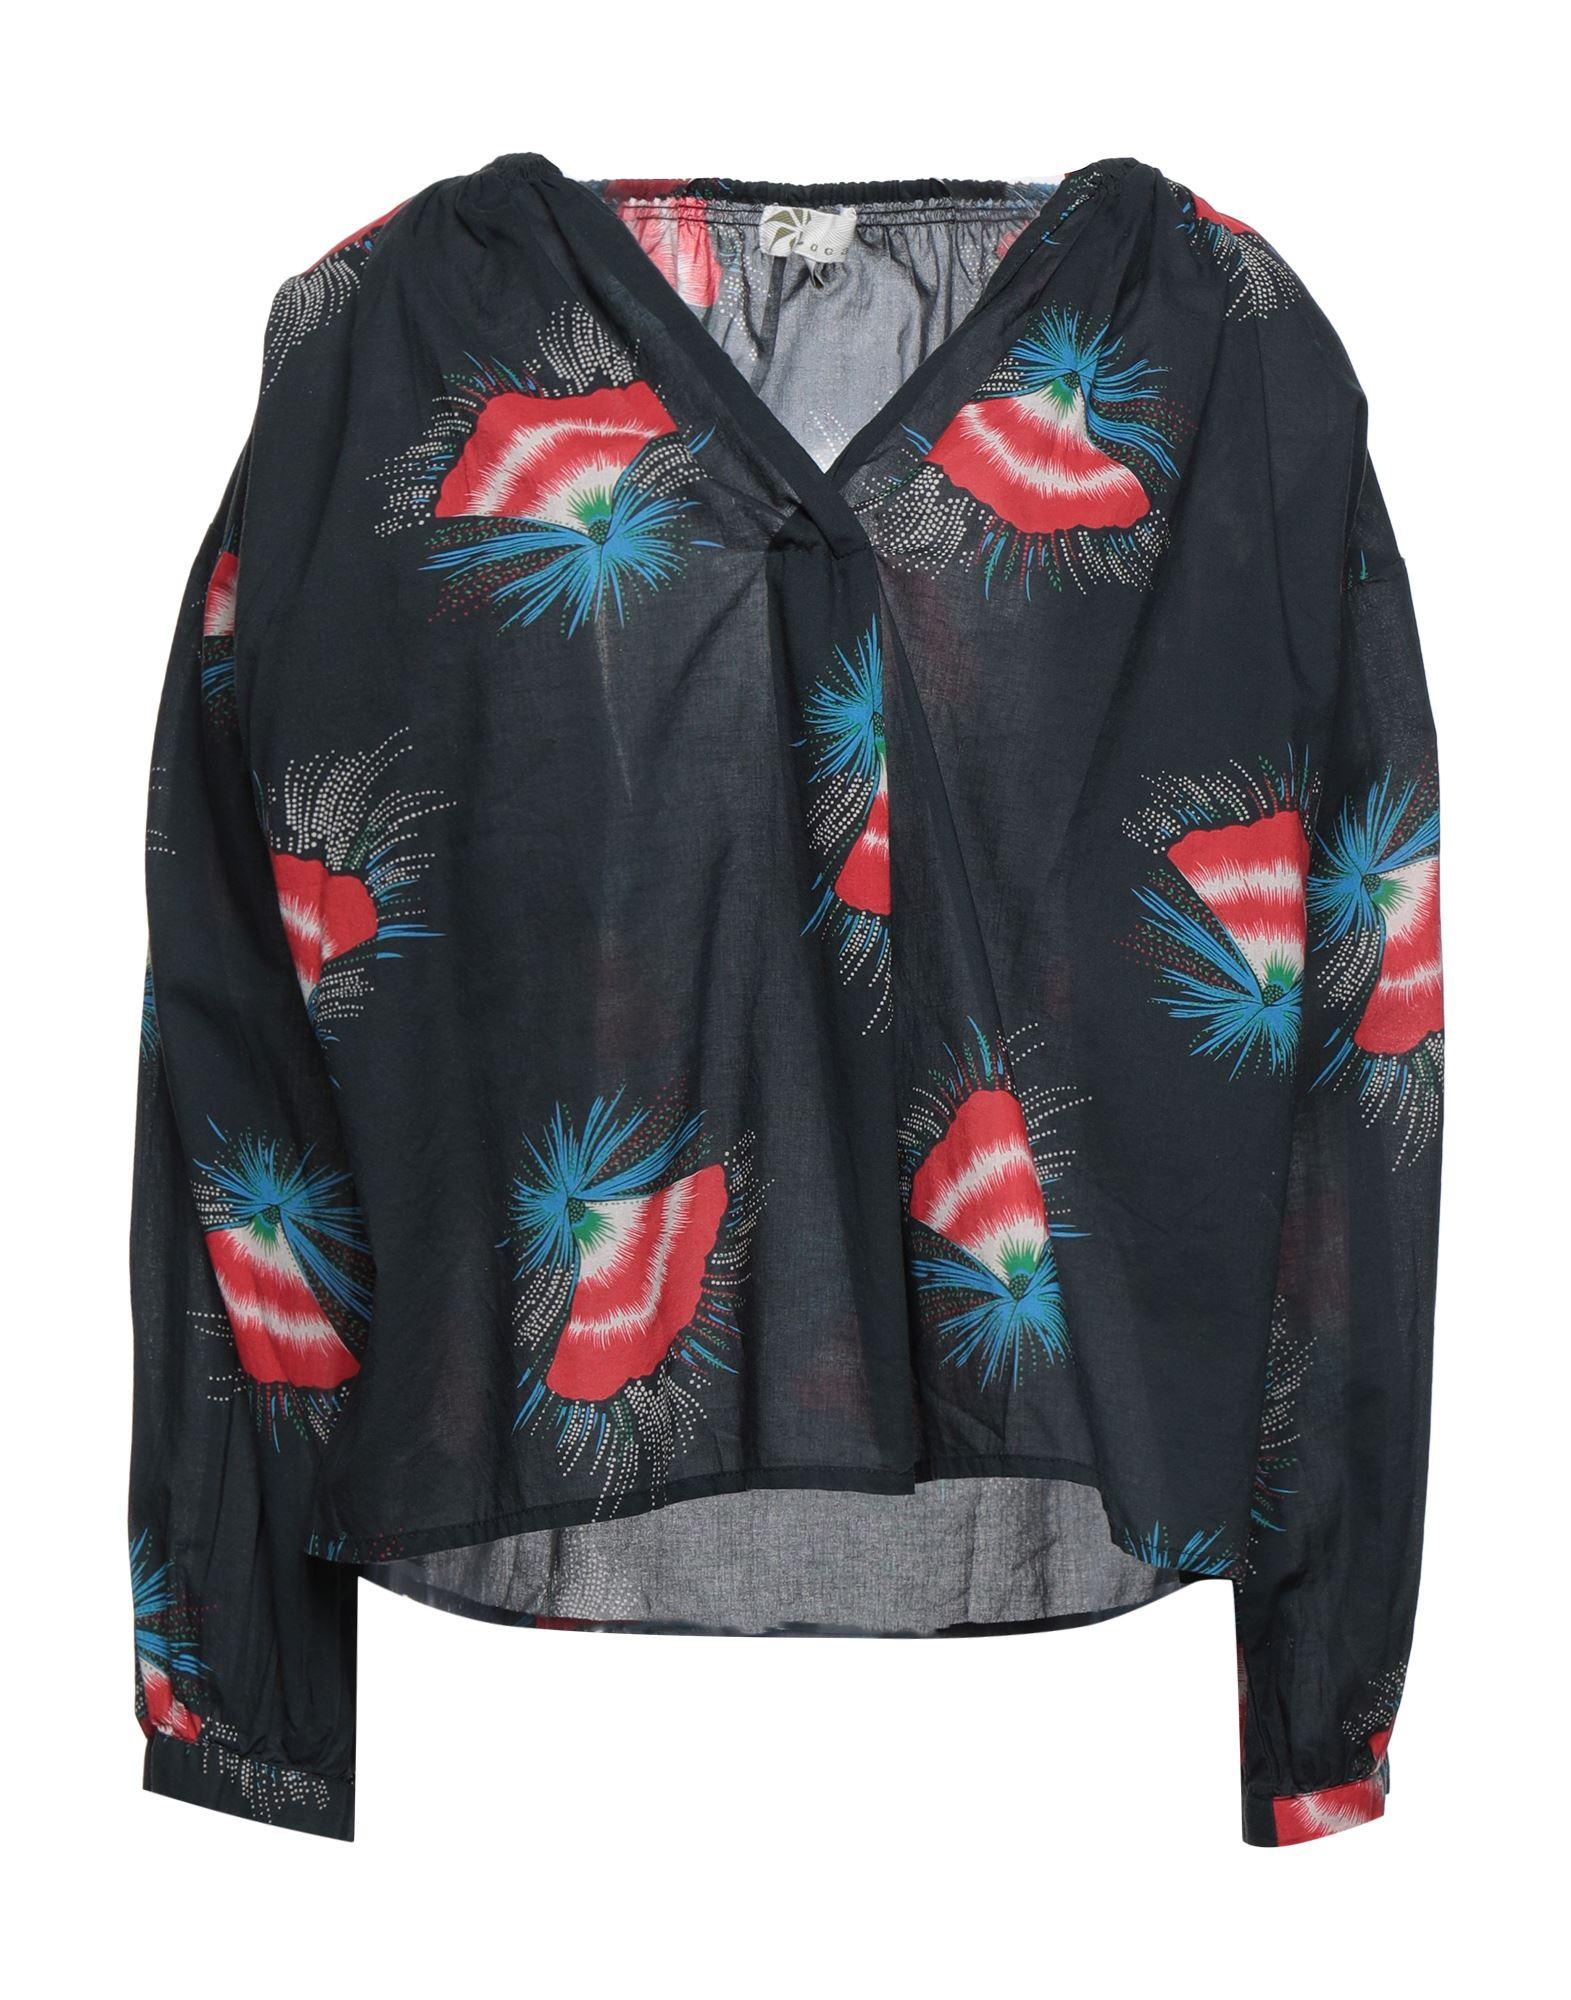 LOCAL APPAREL Блузка local apparel топ без рукавов